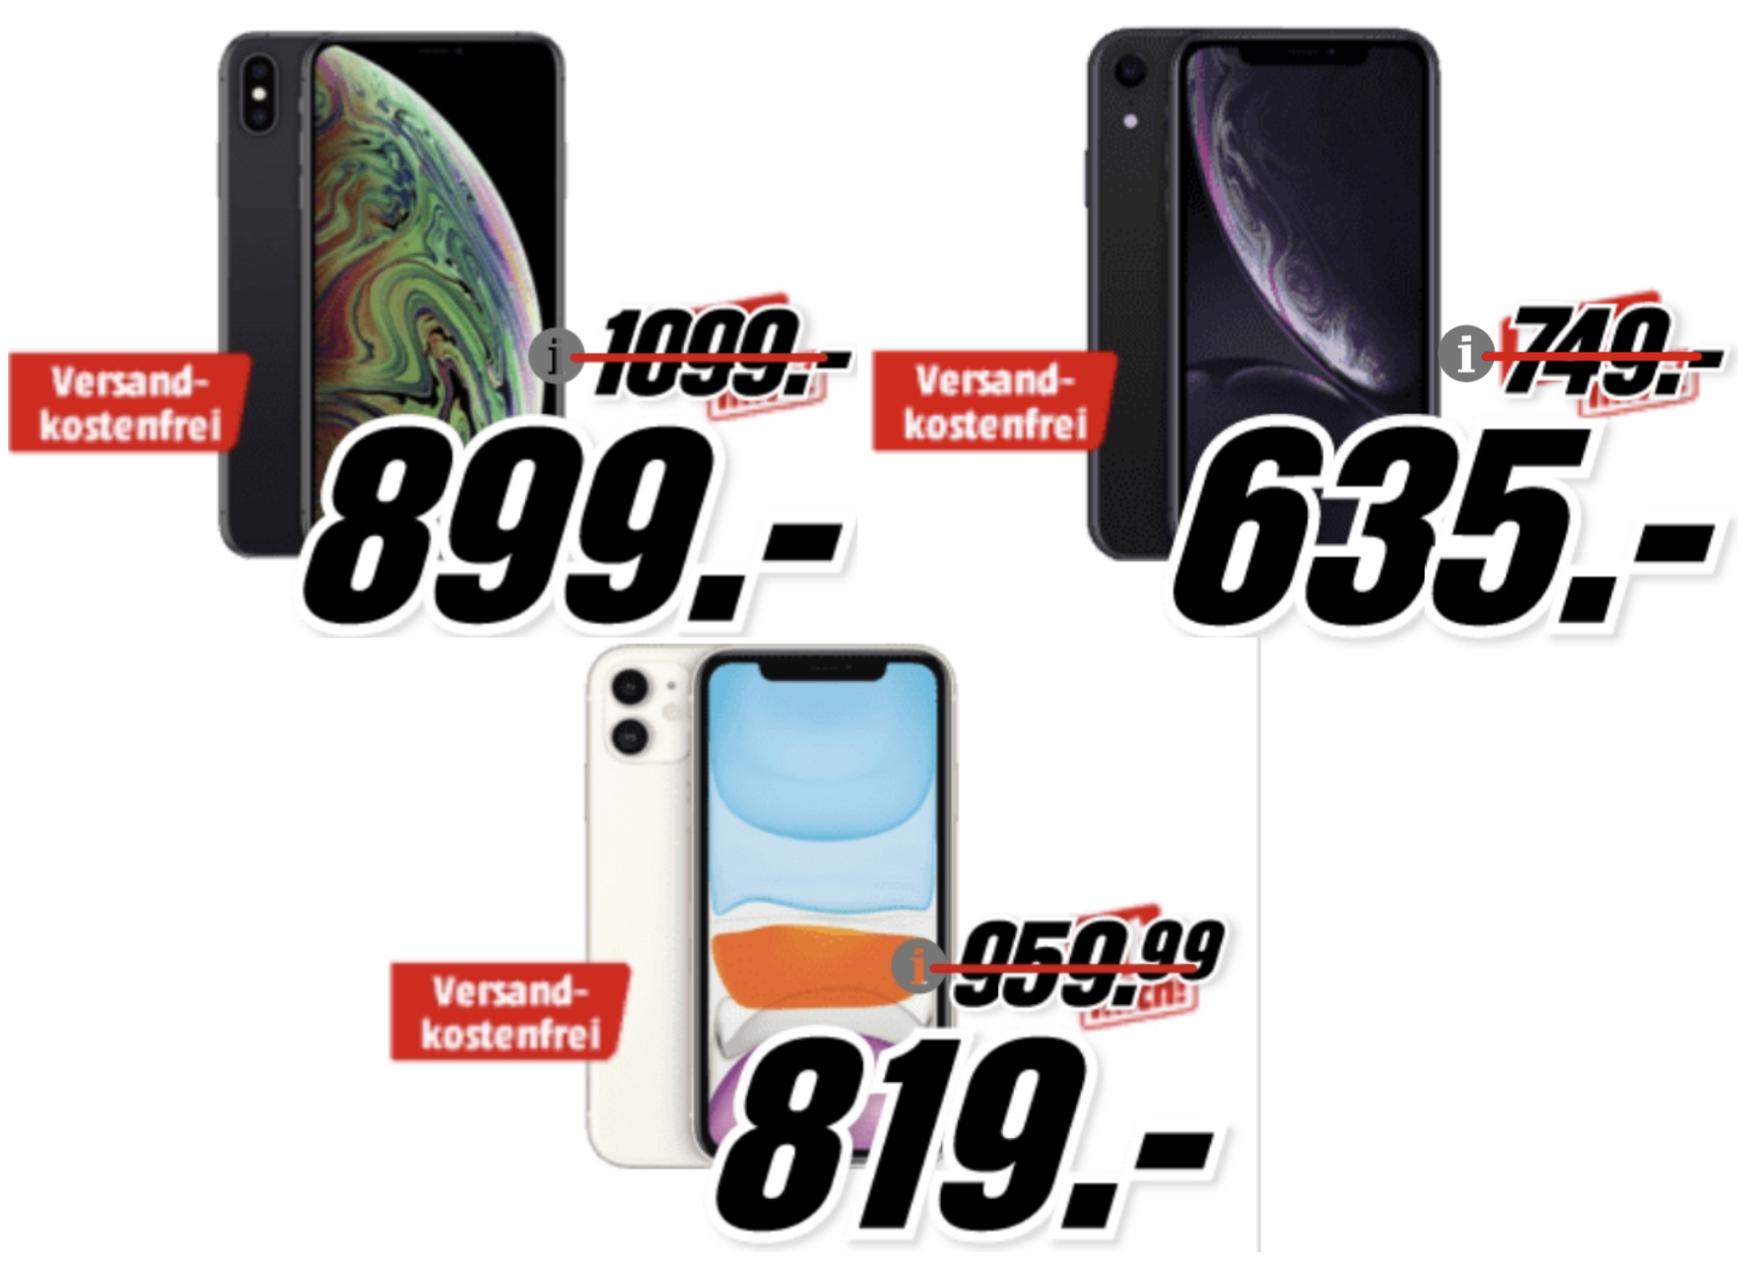 Apple iPhone XS Max 256GB für 899€ o. Apple iPhone 11 256GB für 819€ o. Apple iPhone XR 128GB für 635€ + 1 Jahr Apple TV+ inkl. Versand